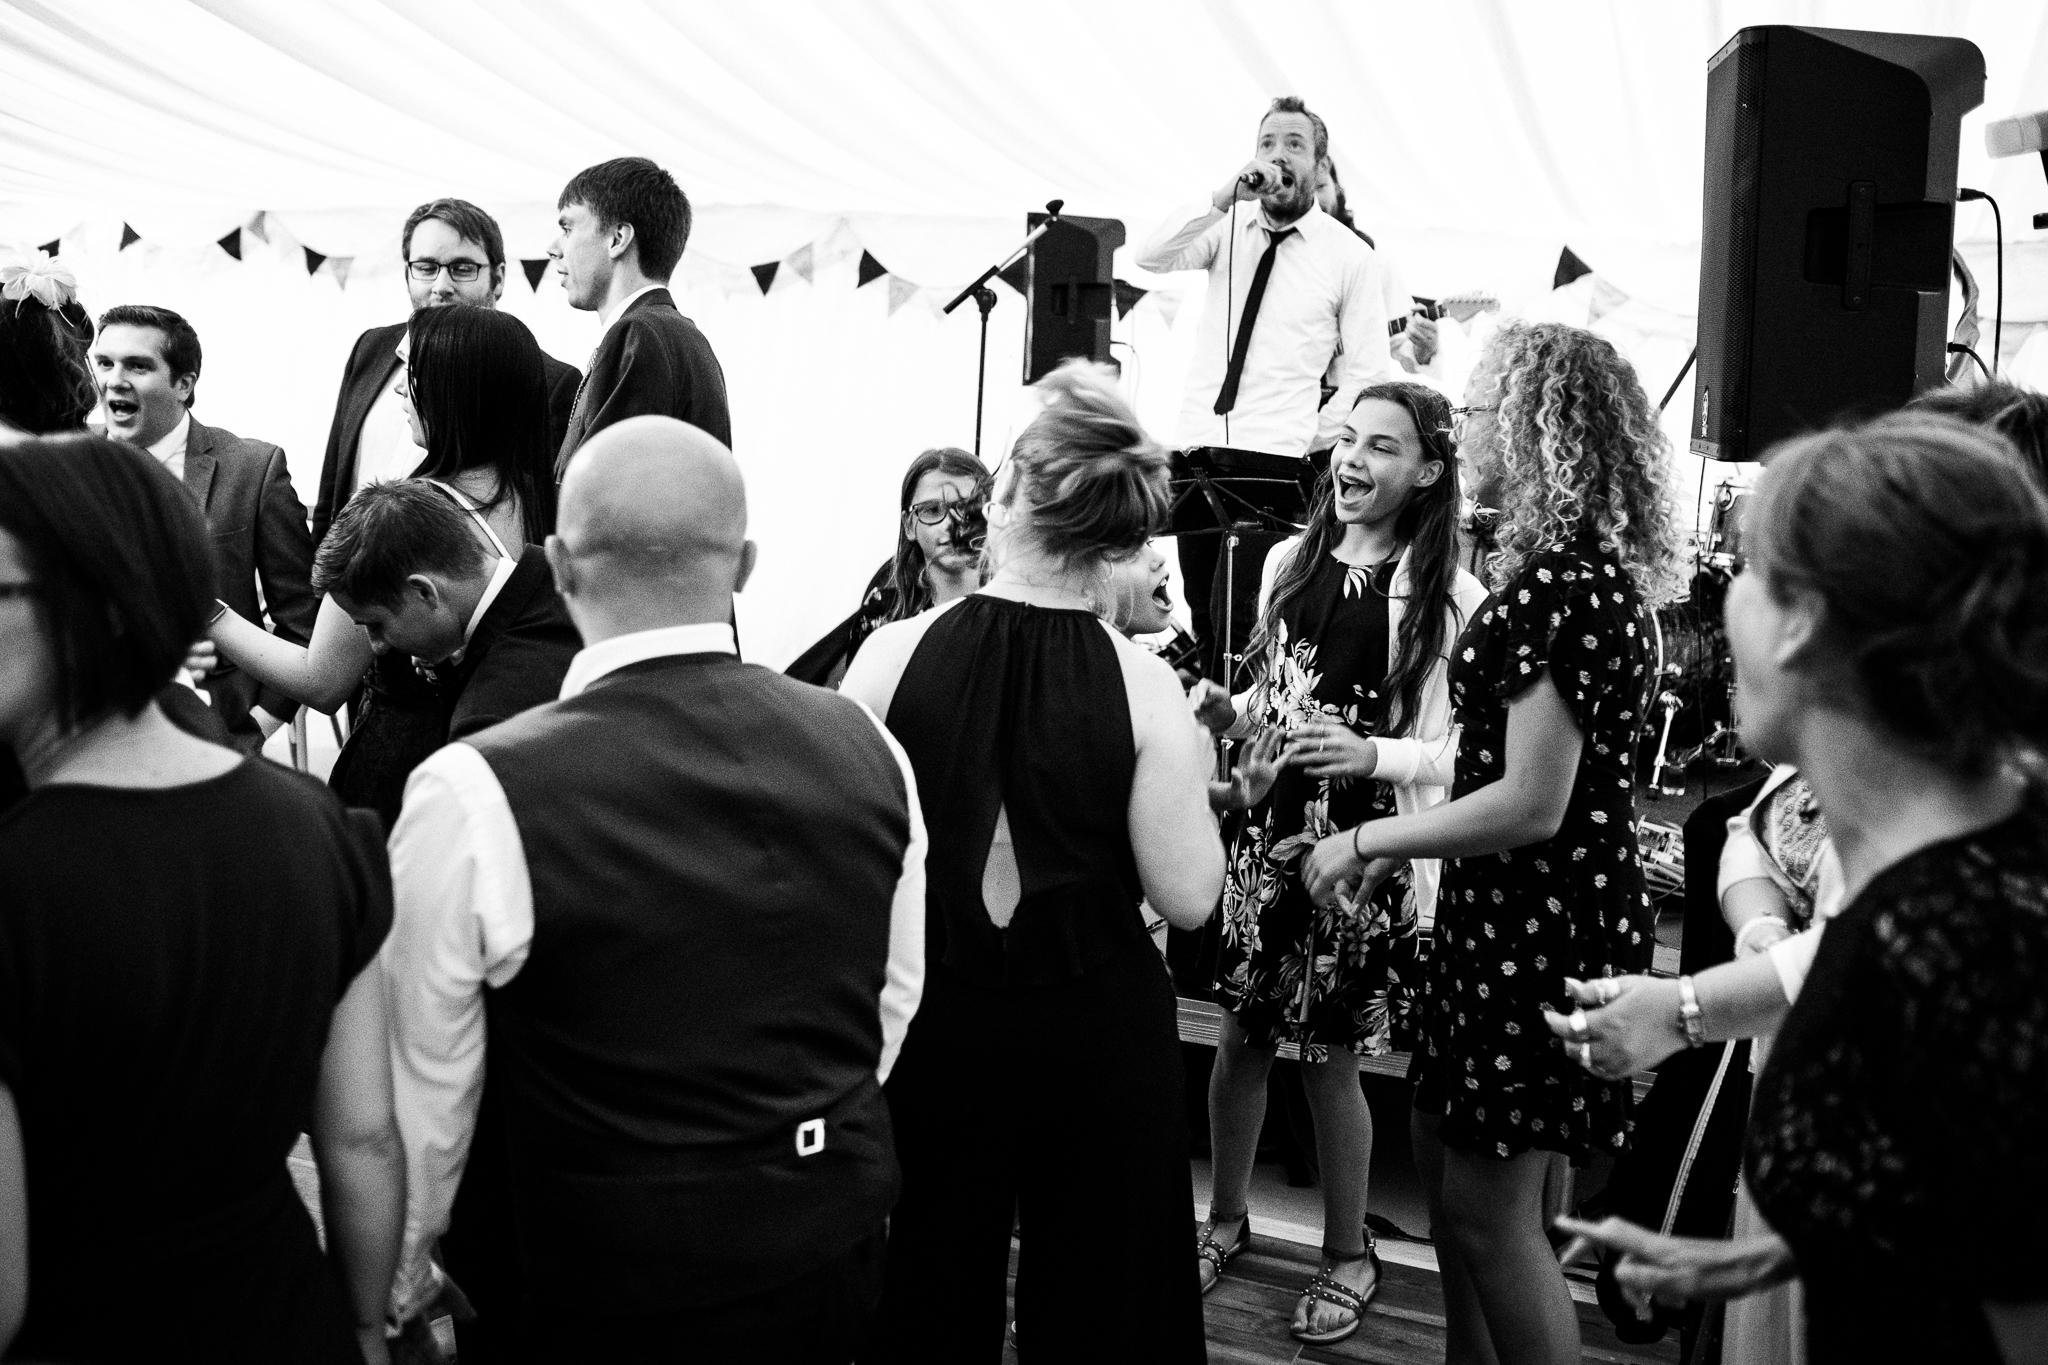 Relaxed Documentary Wedding Photography at The Wizard Inn, Alderley Edge Cheshire - Jenny Harper-84.jpg